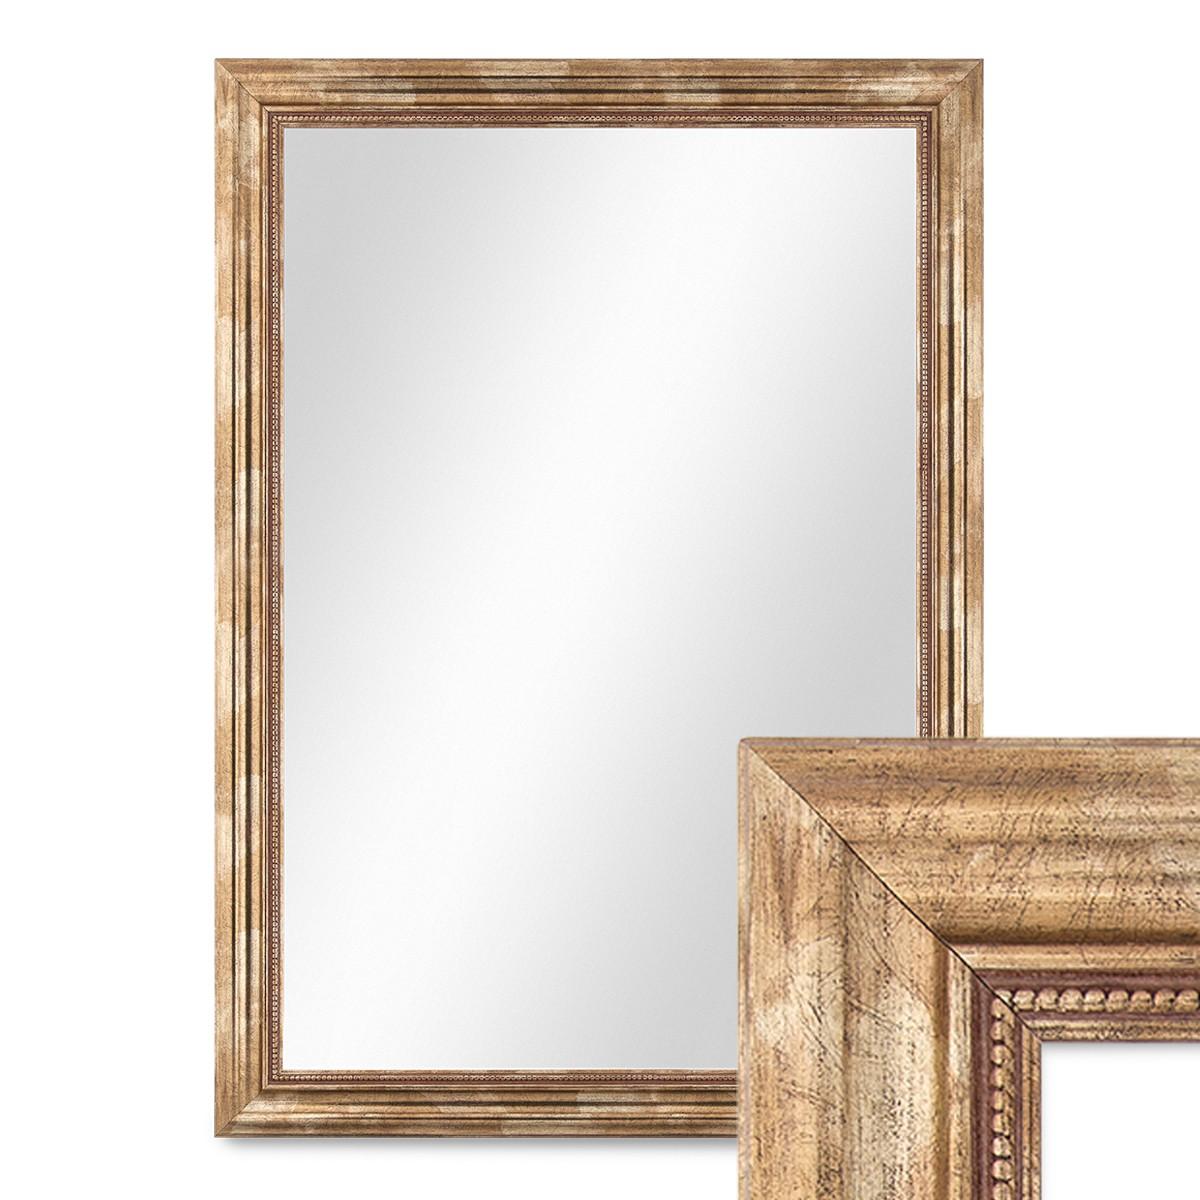 Wand spiegel 70x90 cm im massivholz rahmen barock stil for Spiegel 70x90